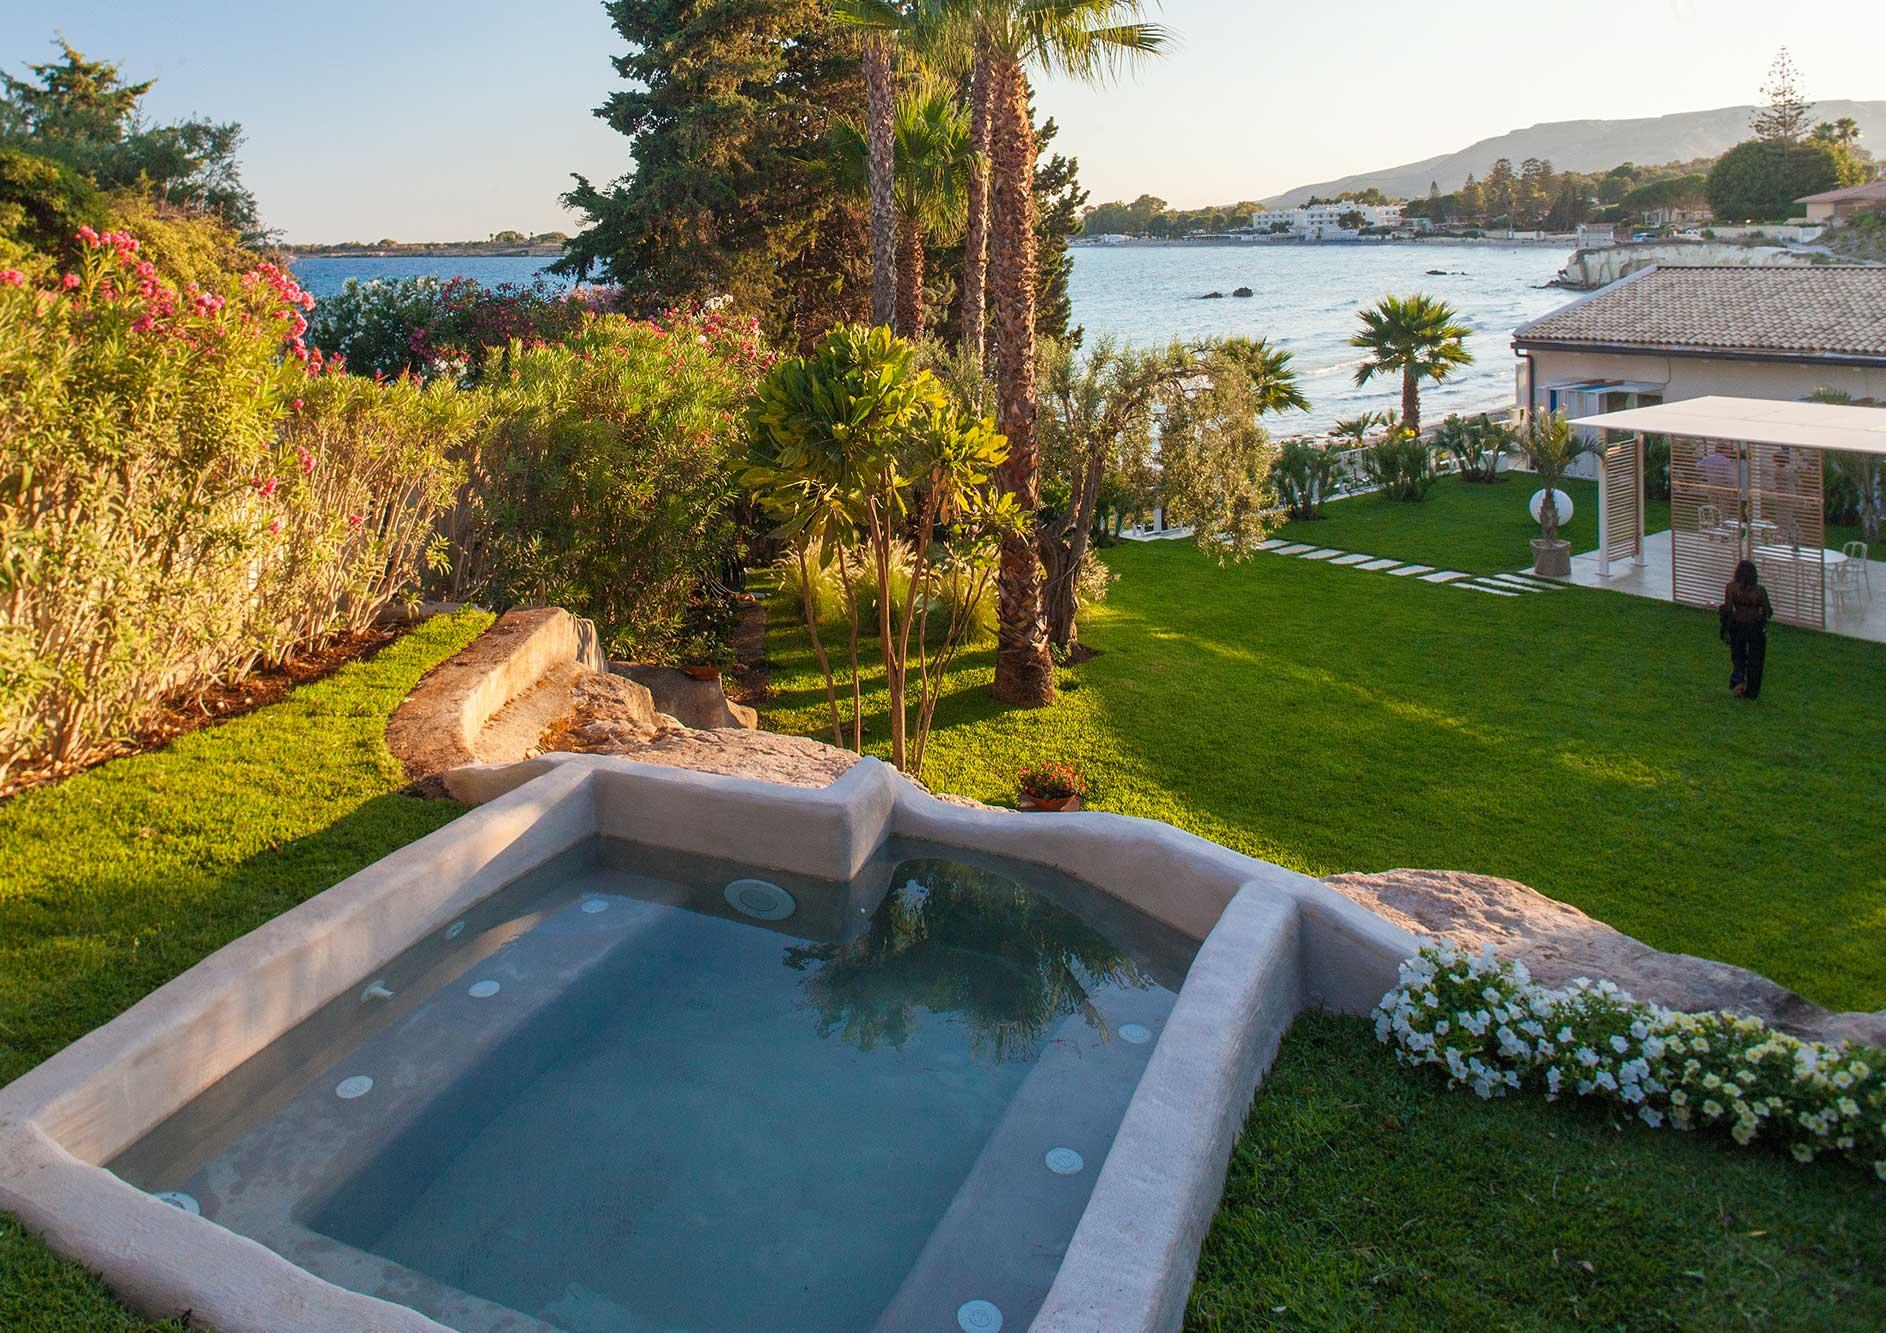 calapetra-resort-fontane-bianche-siracusa-24